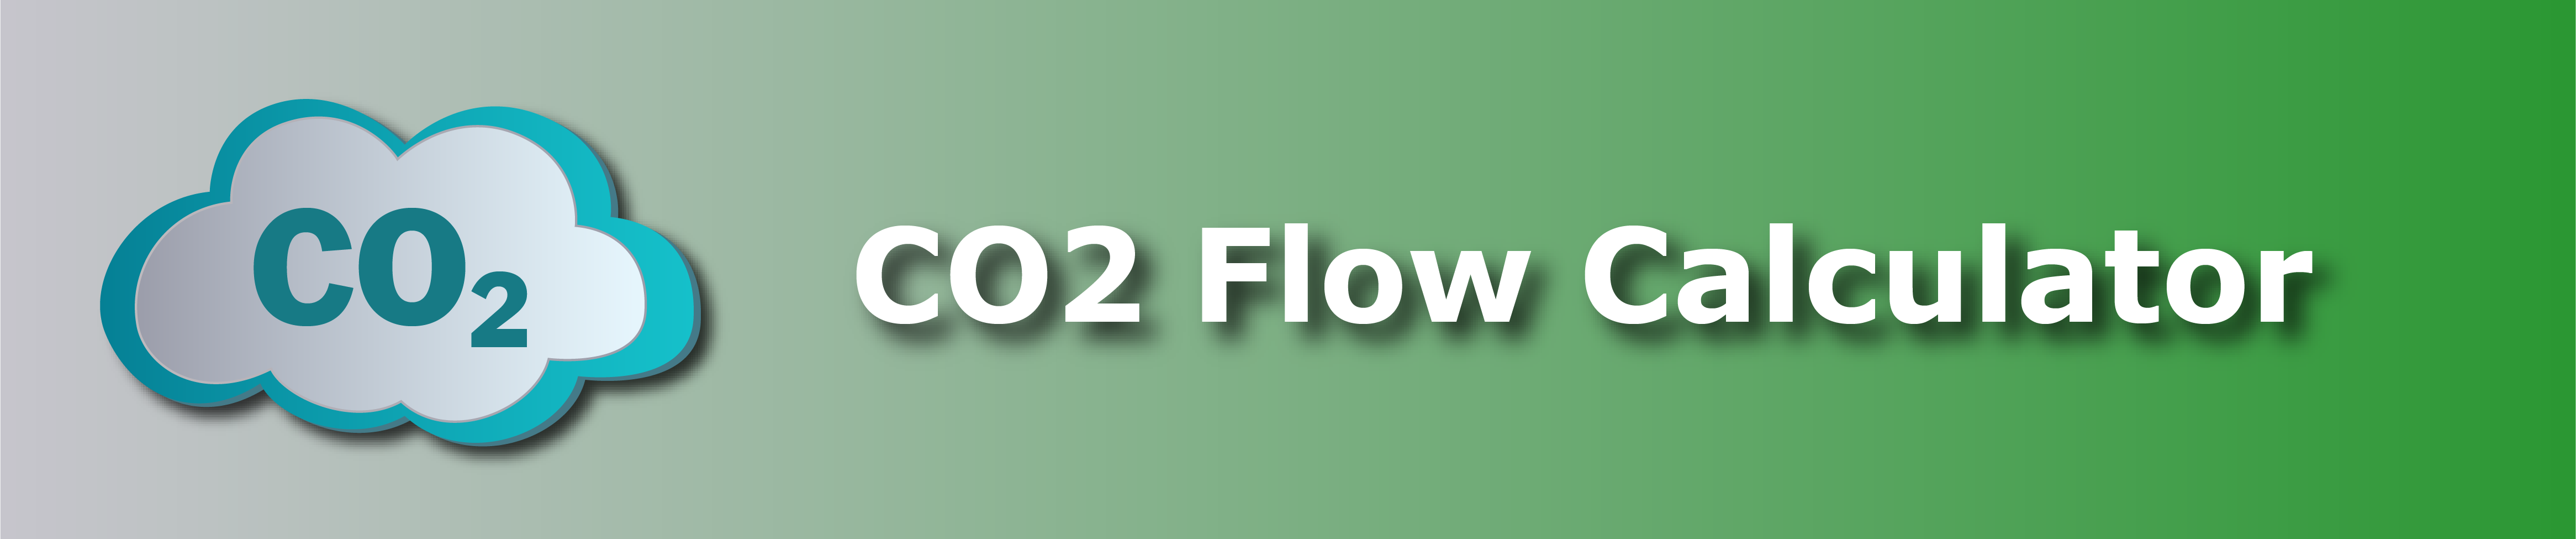 CO2 Flow Rate Calculator